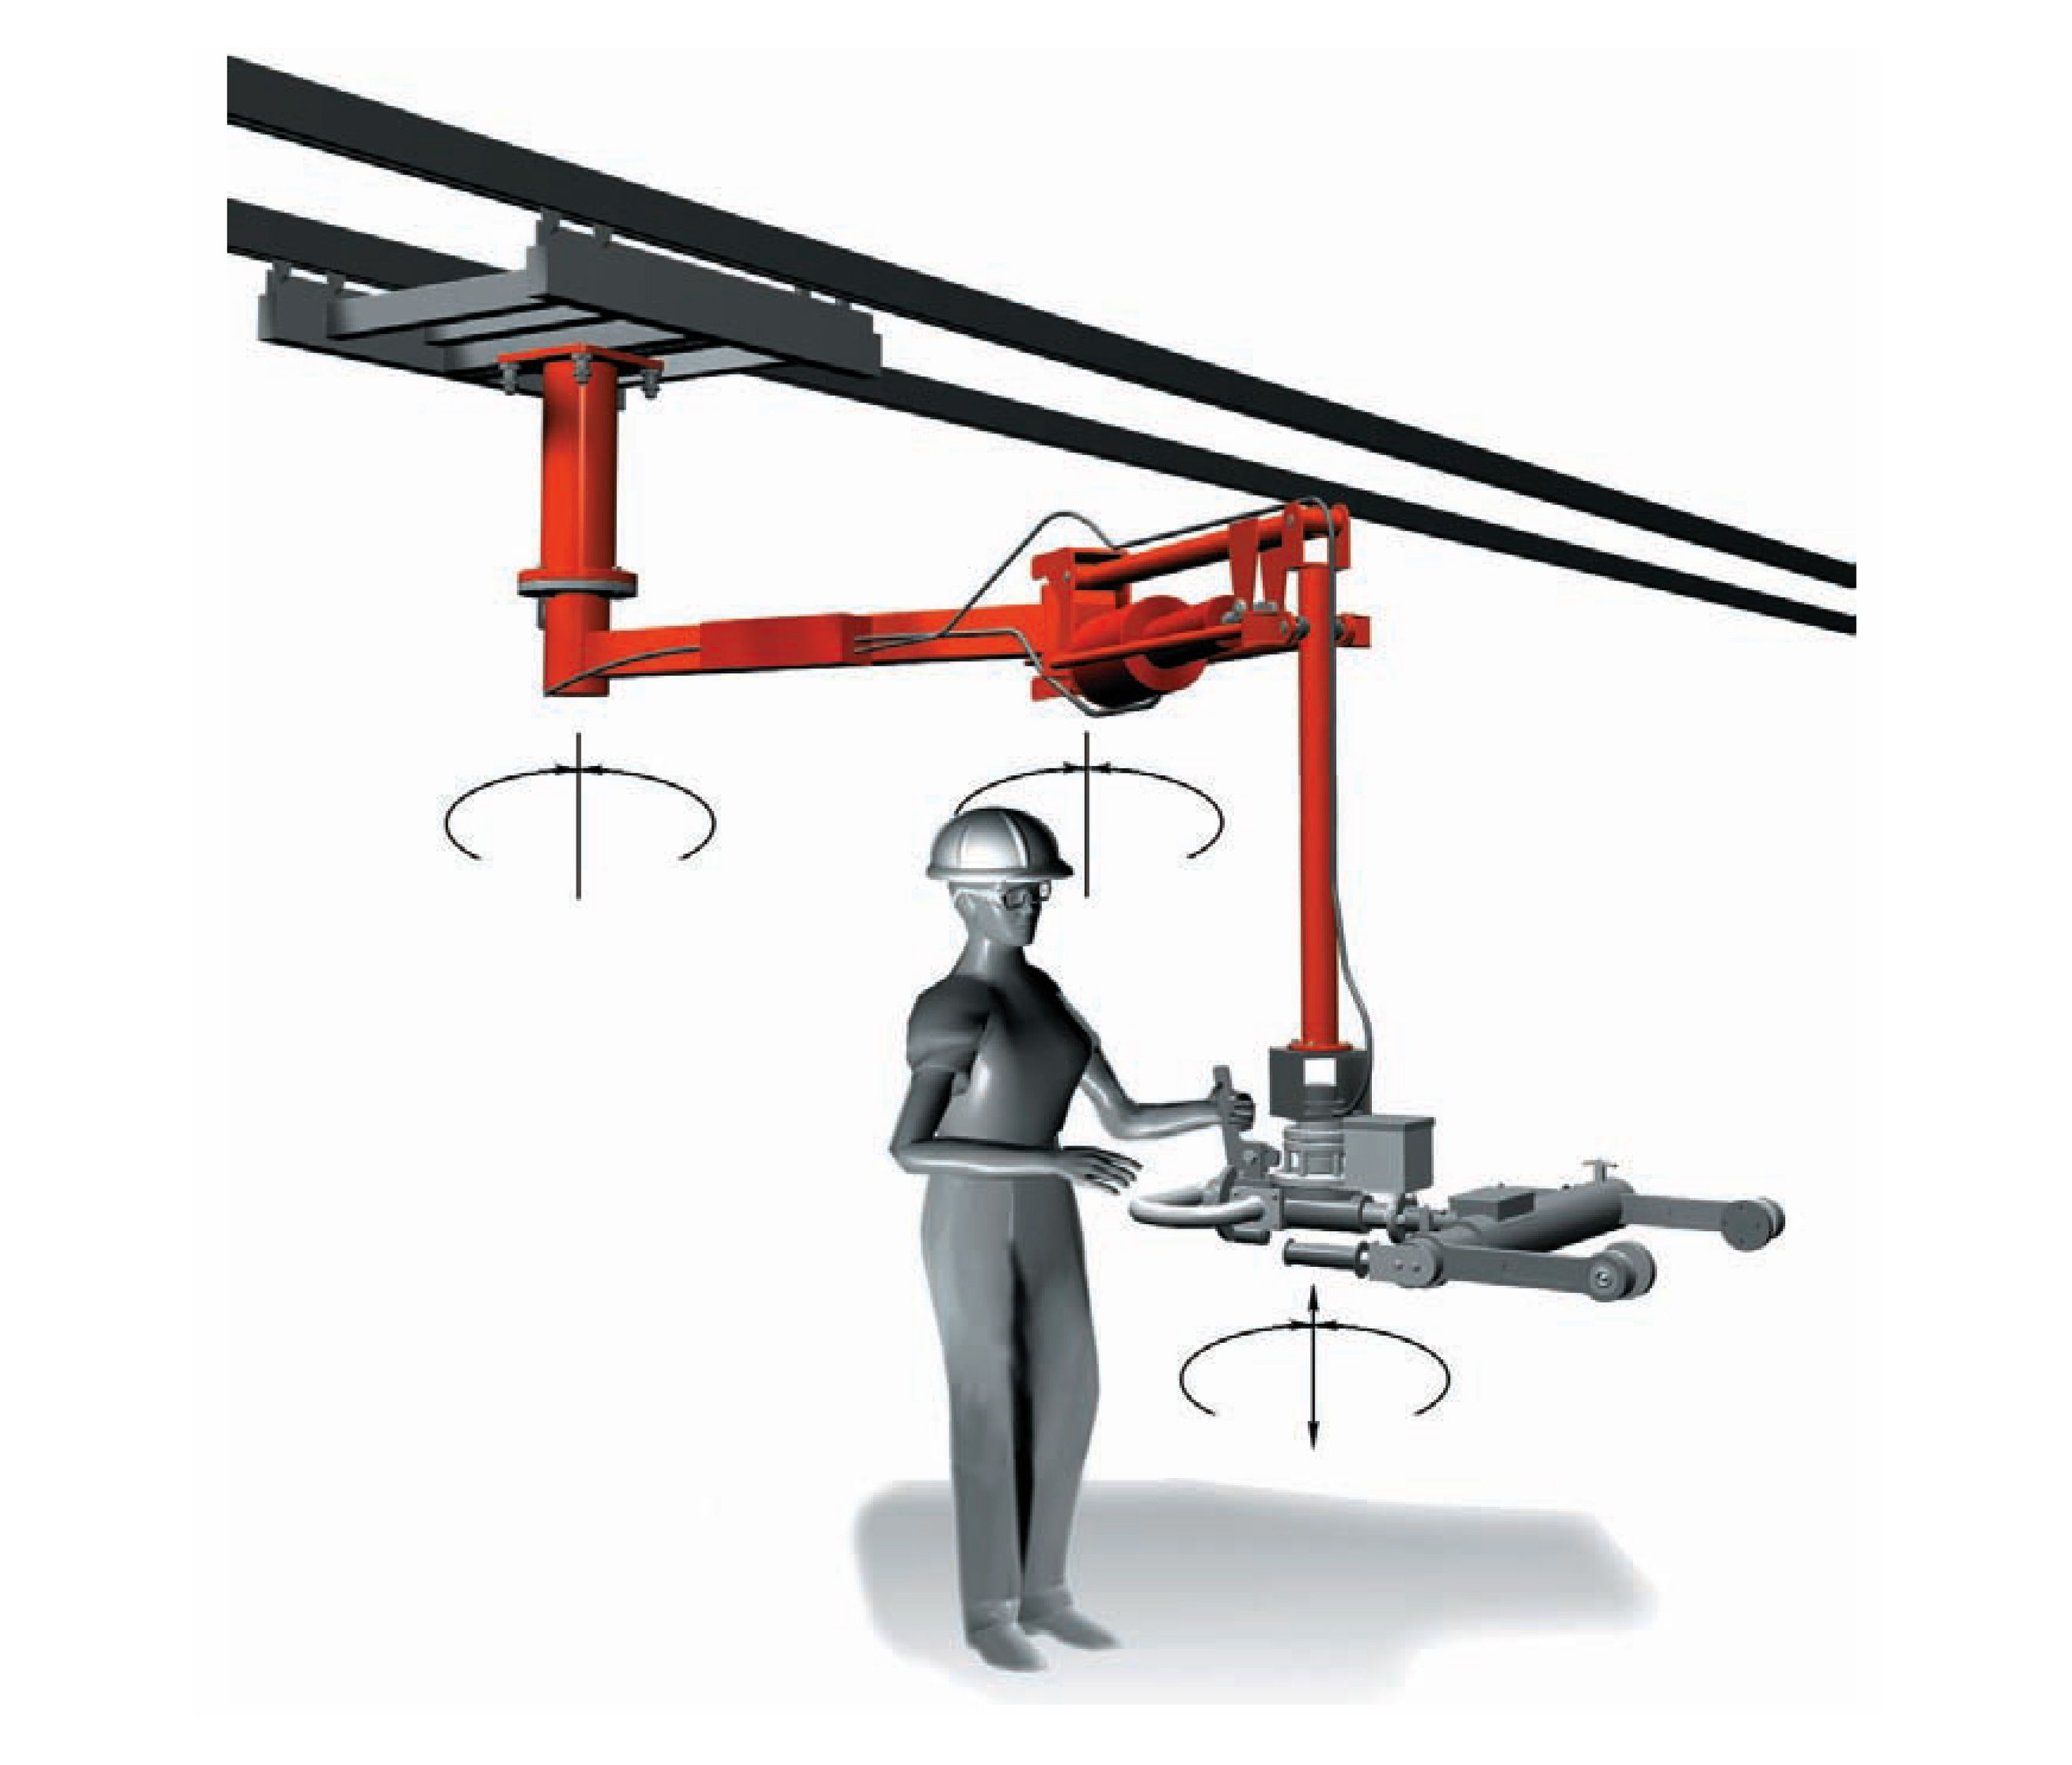 Lift Assist Articulating Arm : Lodearm manipulator arm mekanizma pinterest arms